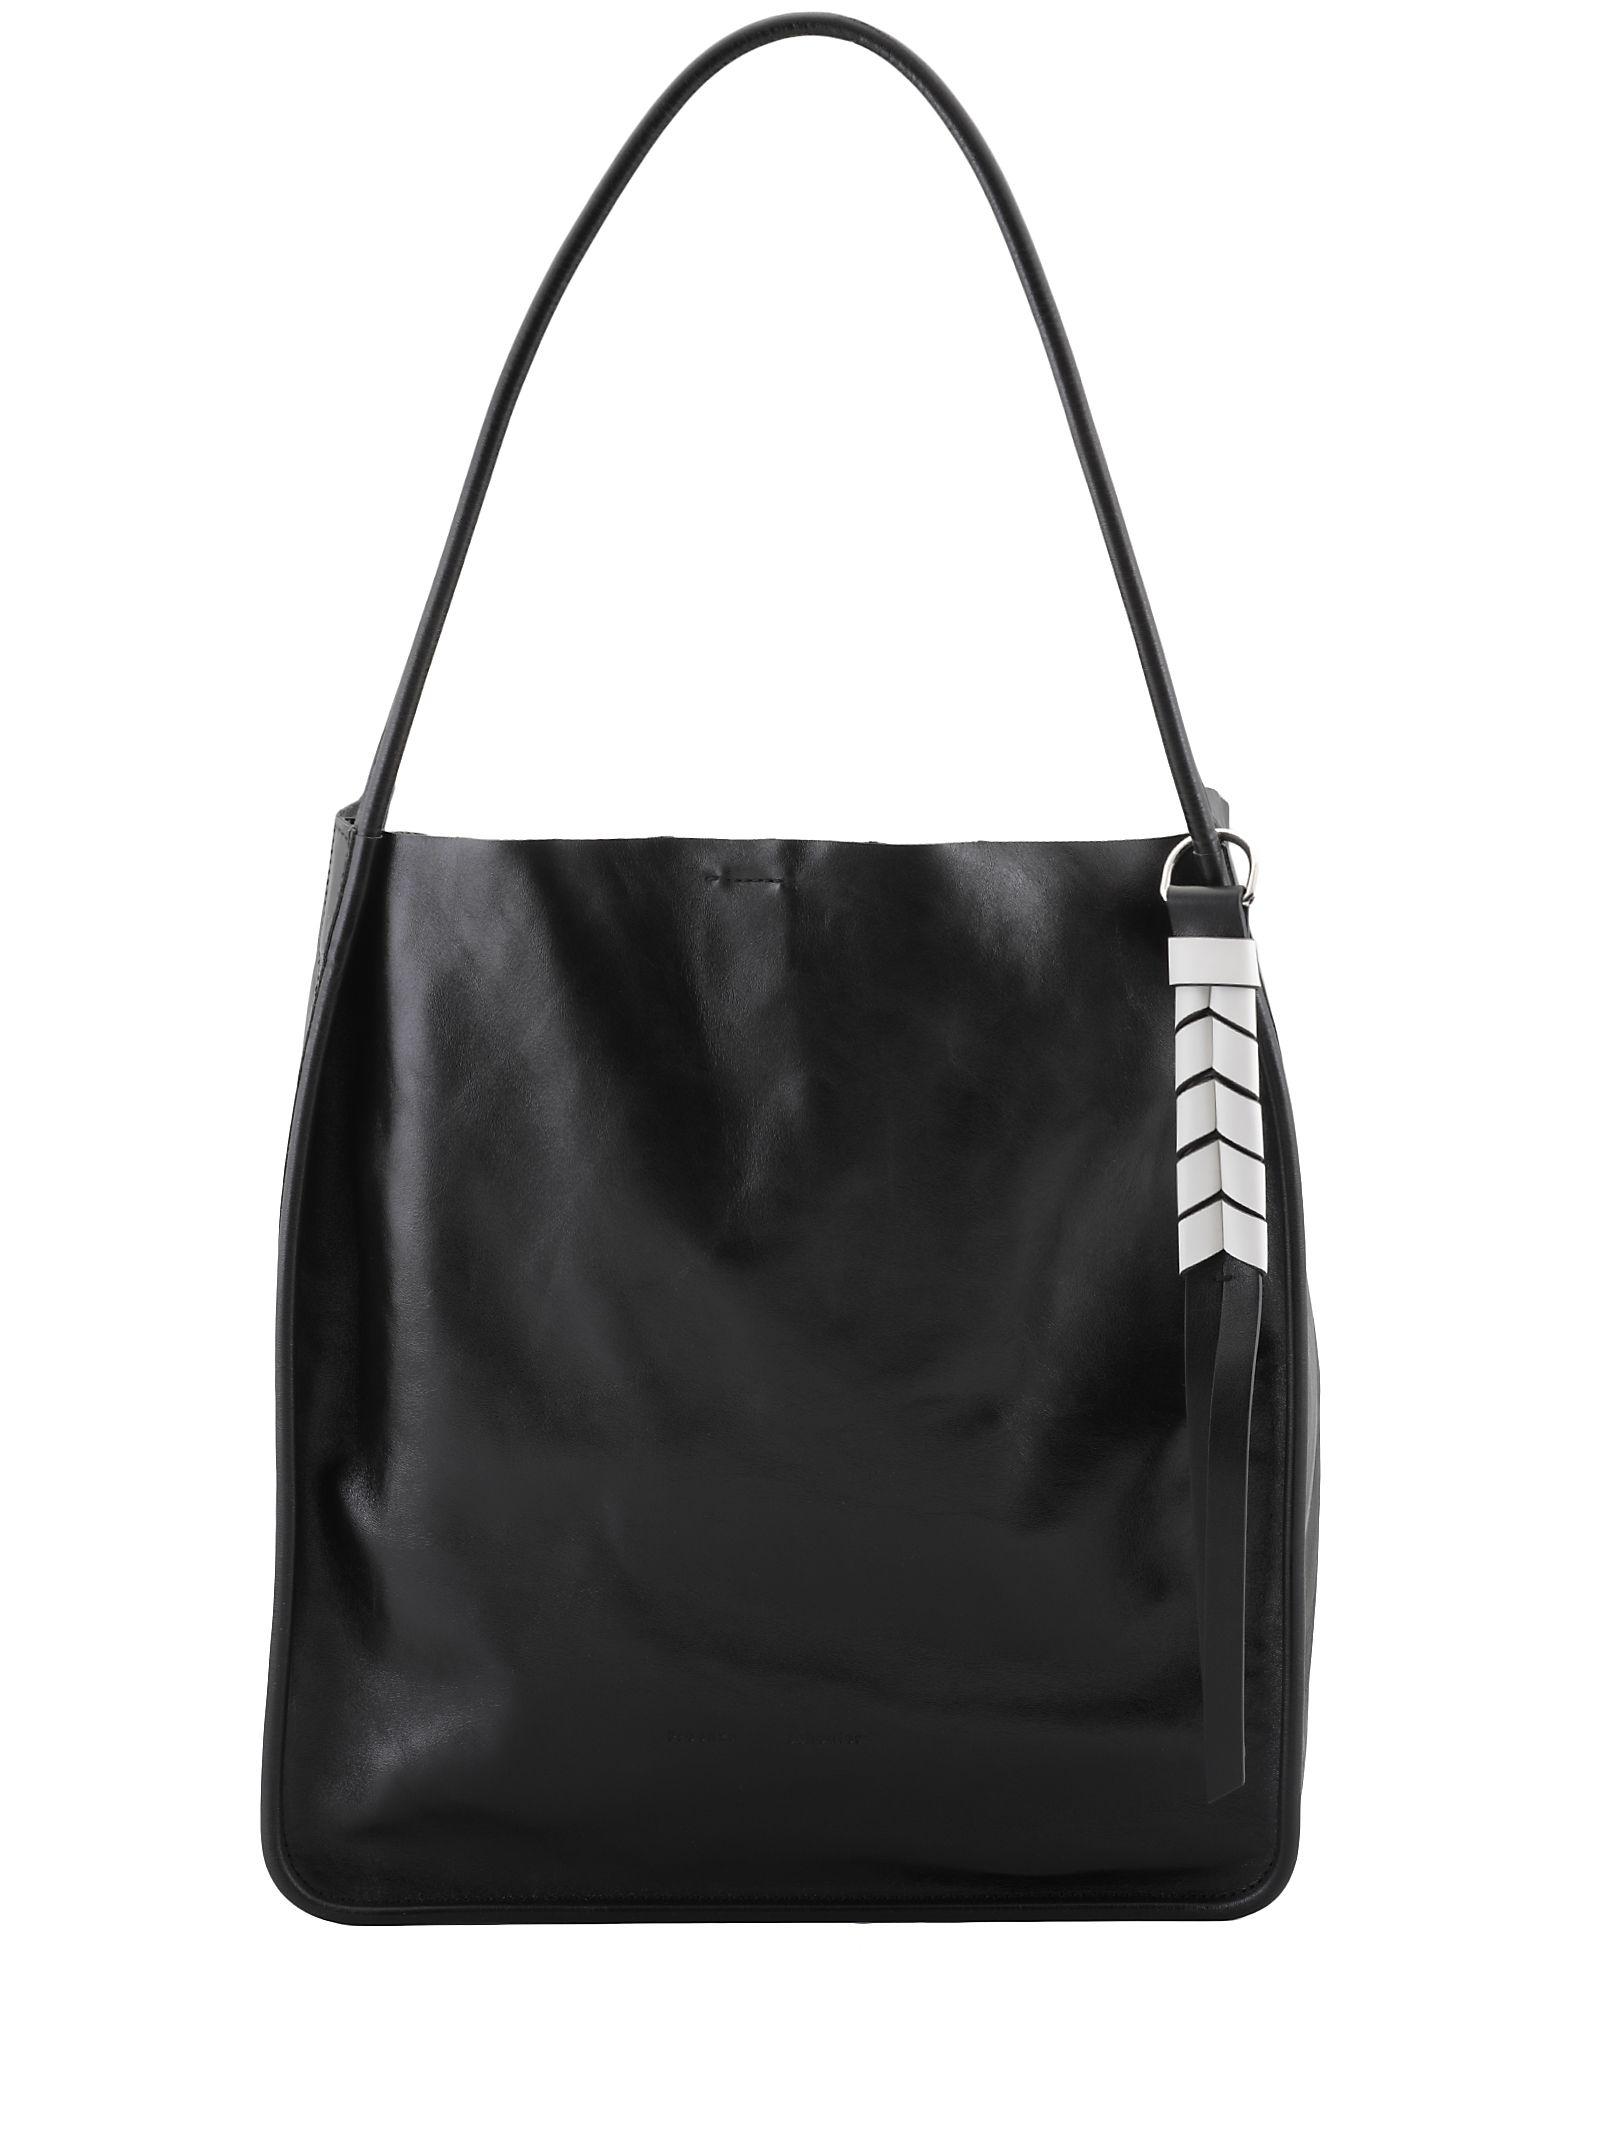 b748a452d049 Proenza Schouler Proenza Schouler Extra Large Tote Bag - Black ...